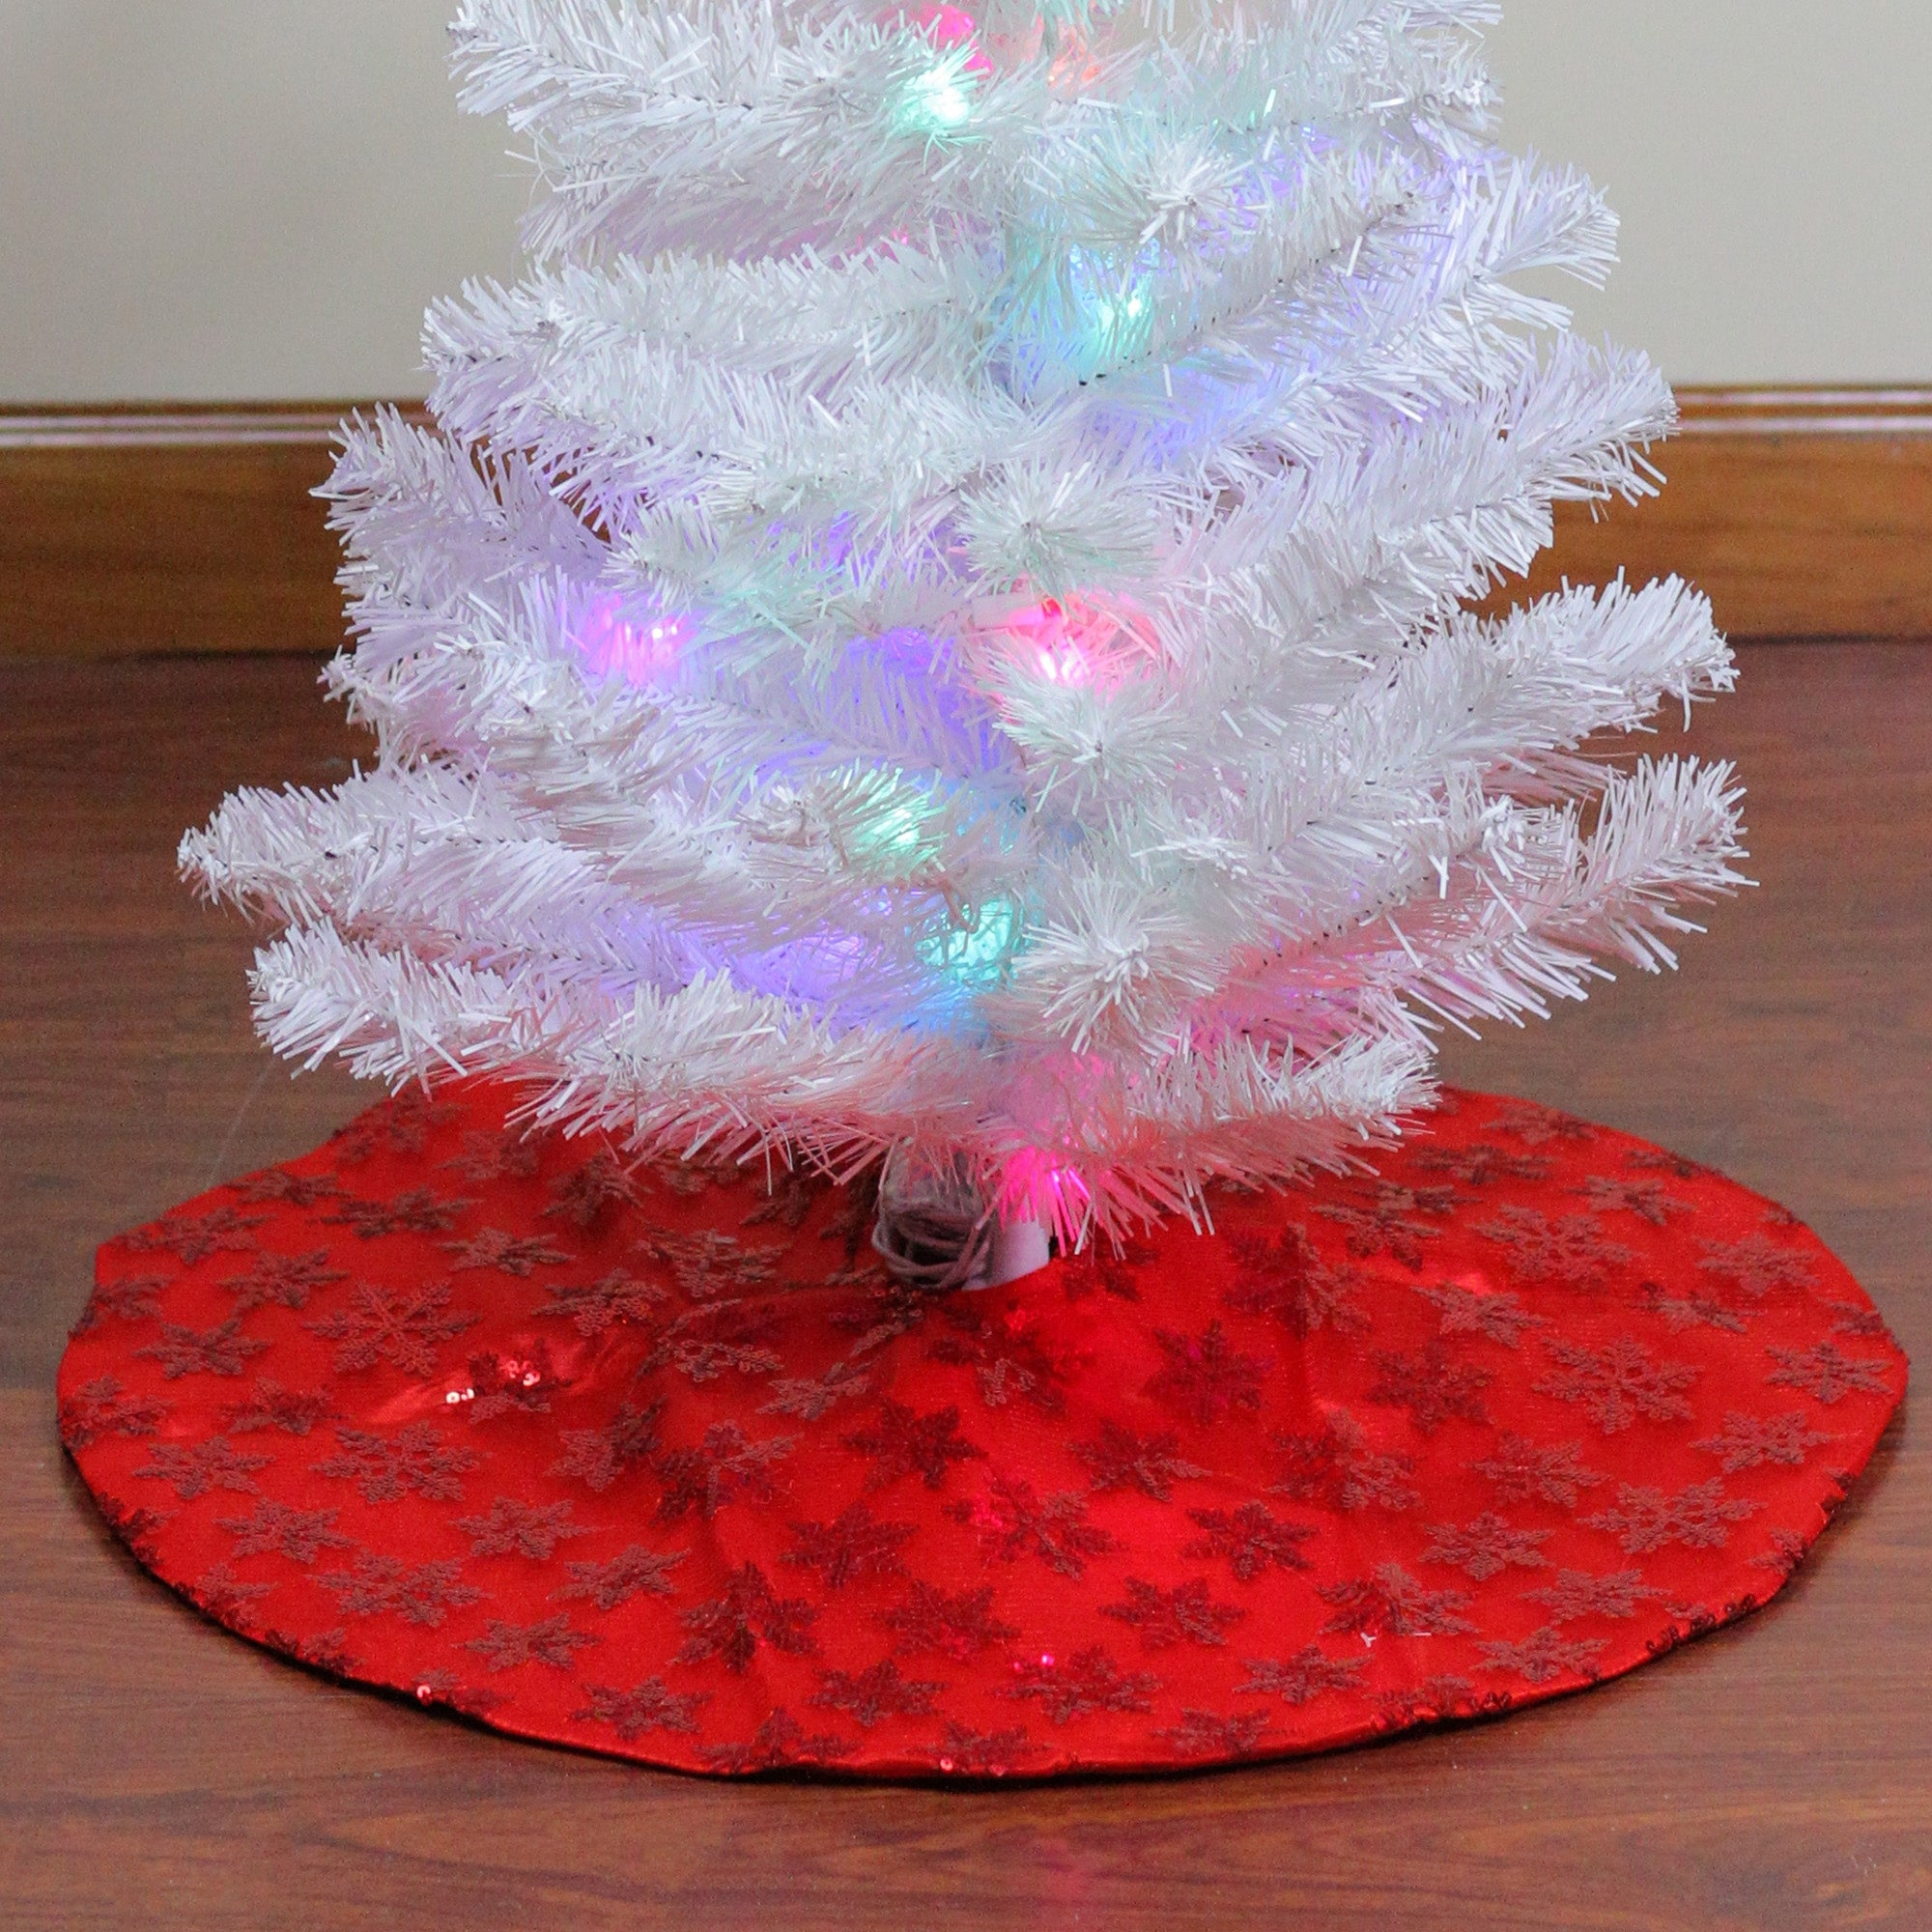 20 Red Sequin Snowflake Pattern Mini Christmas Tree Skirt Overstock 16545937